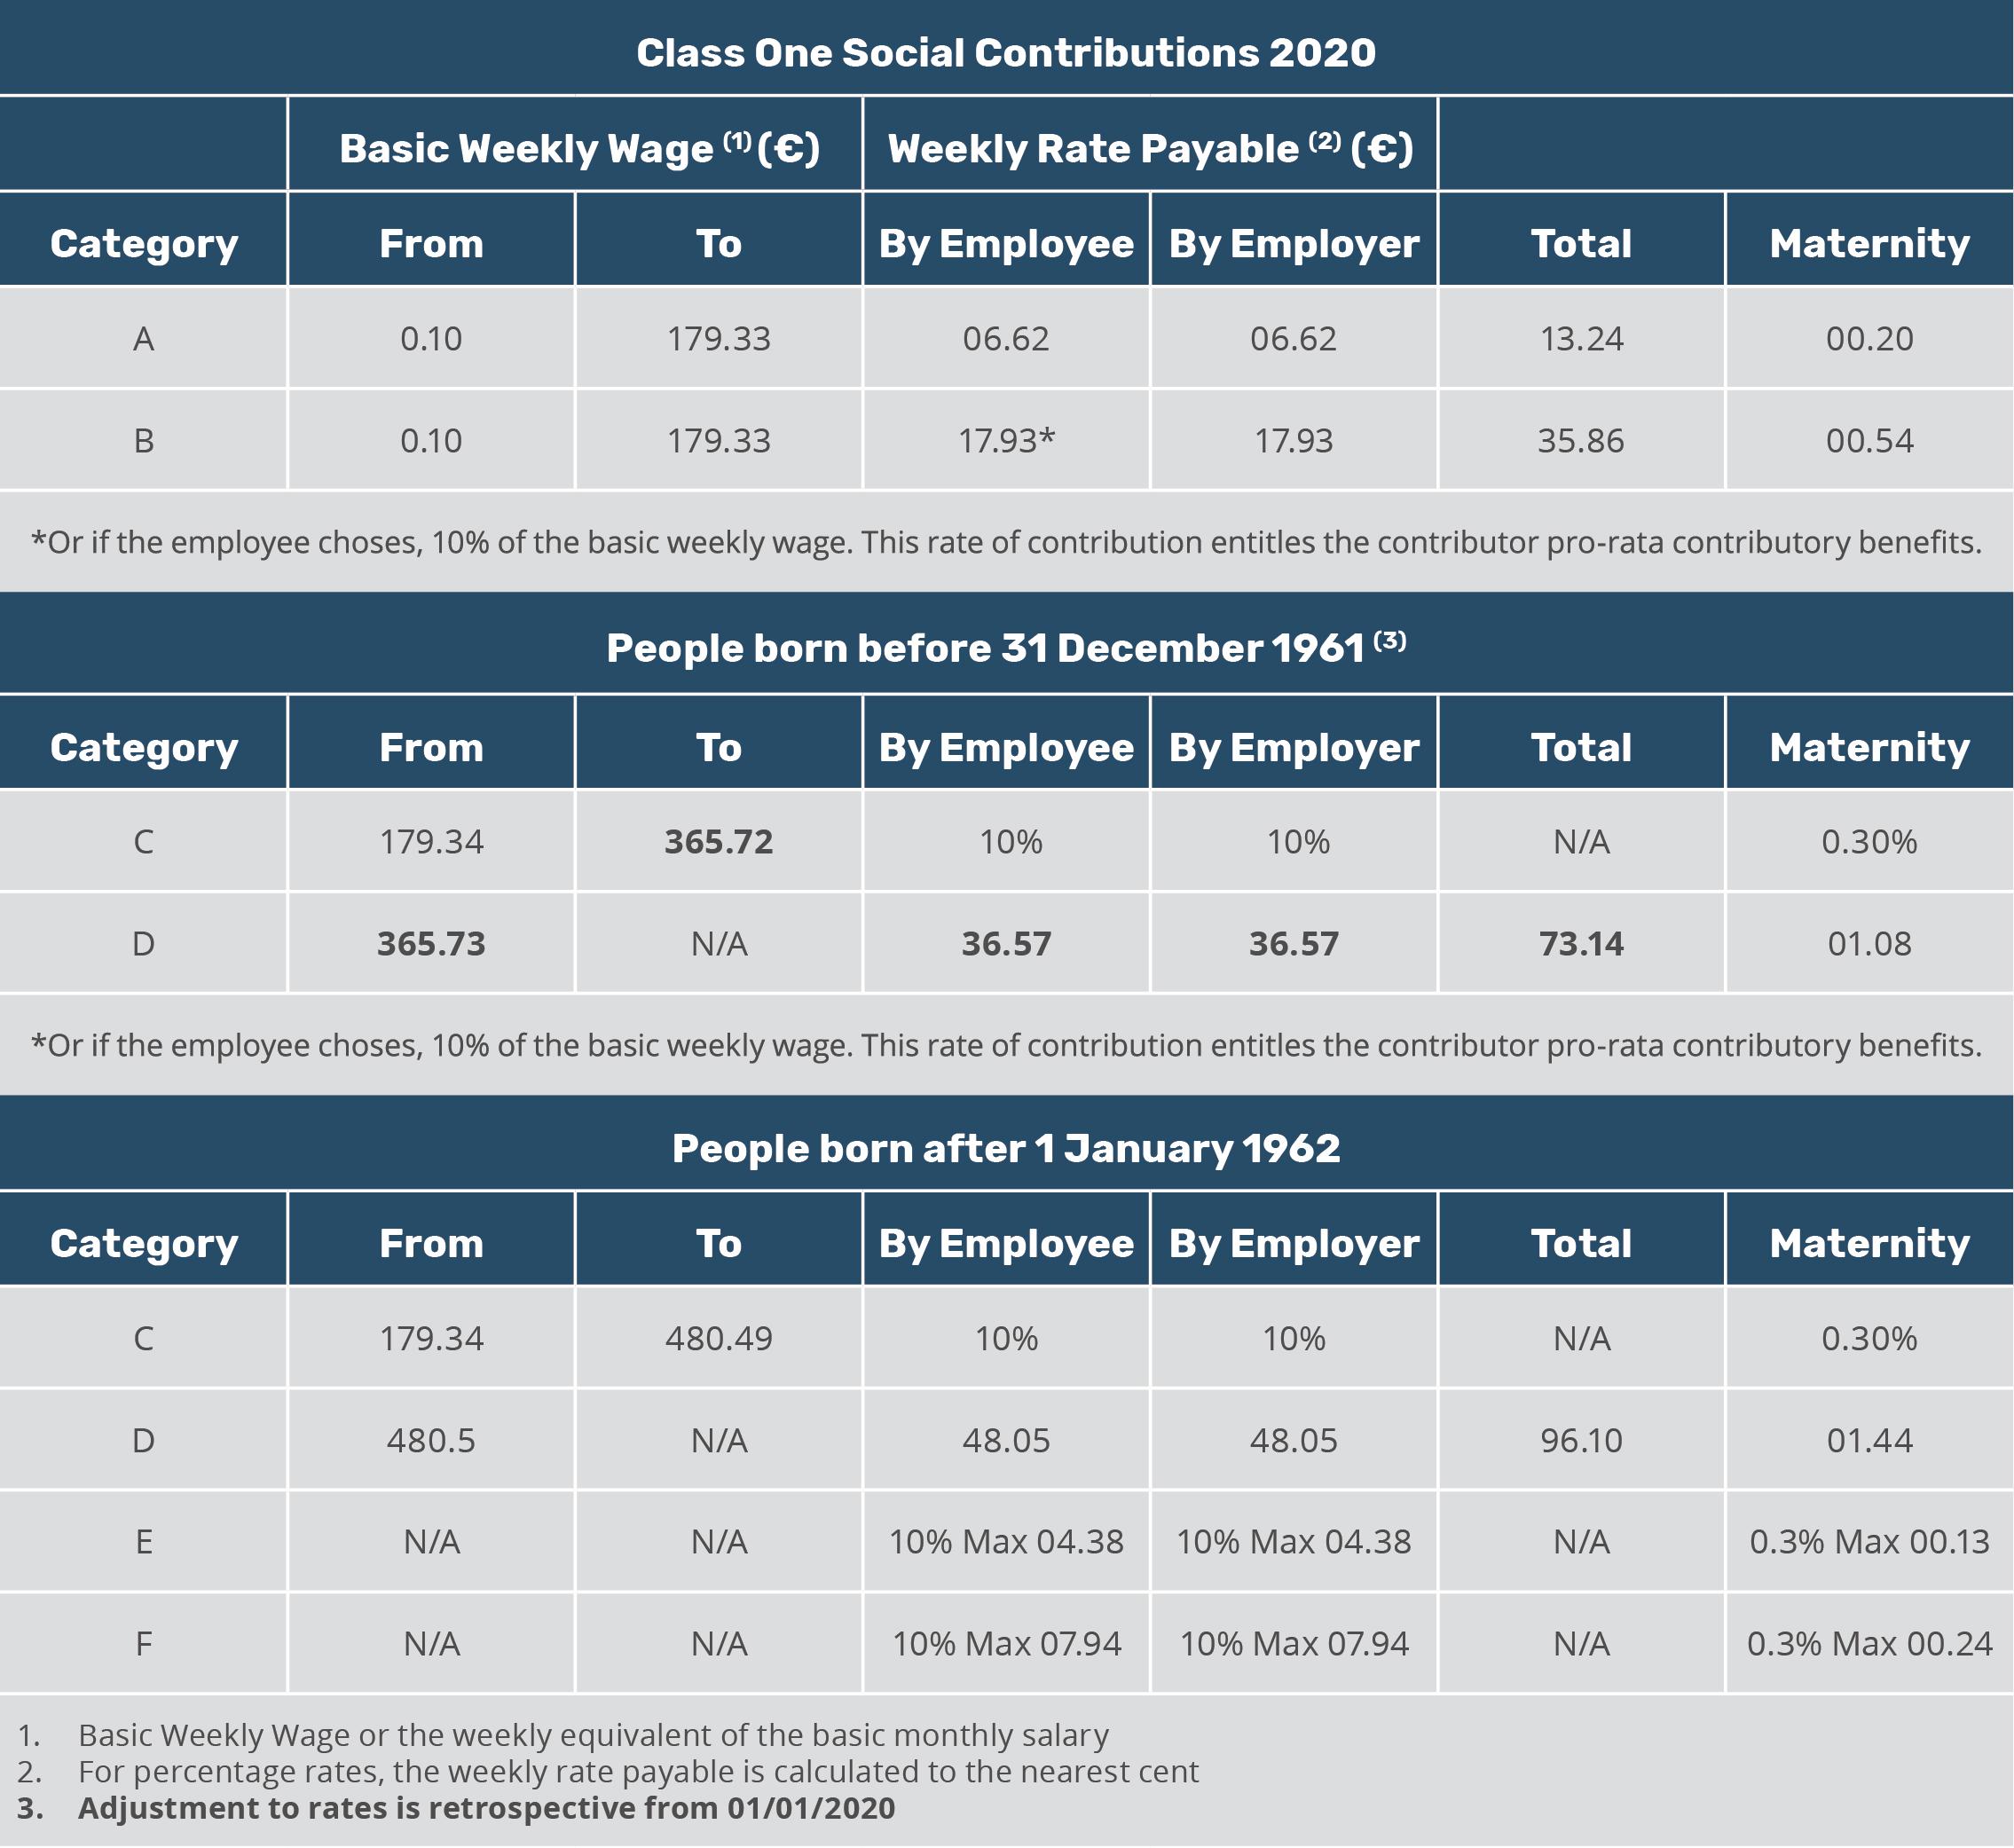 Malta class 1 social contributions 2020